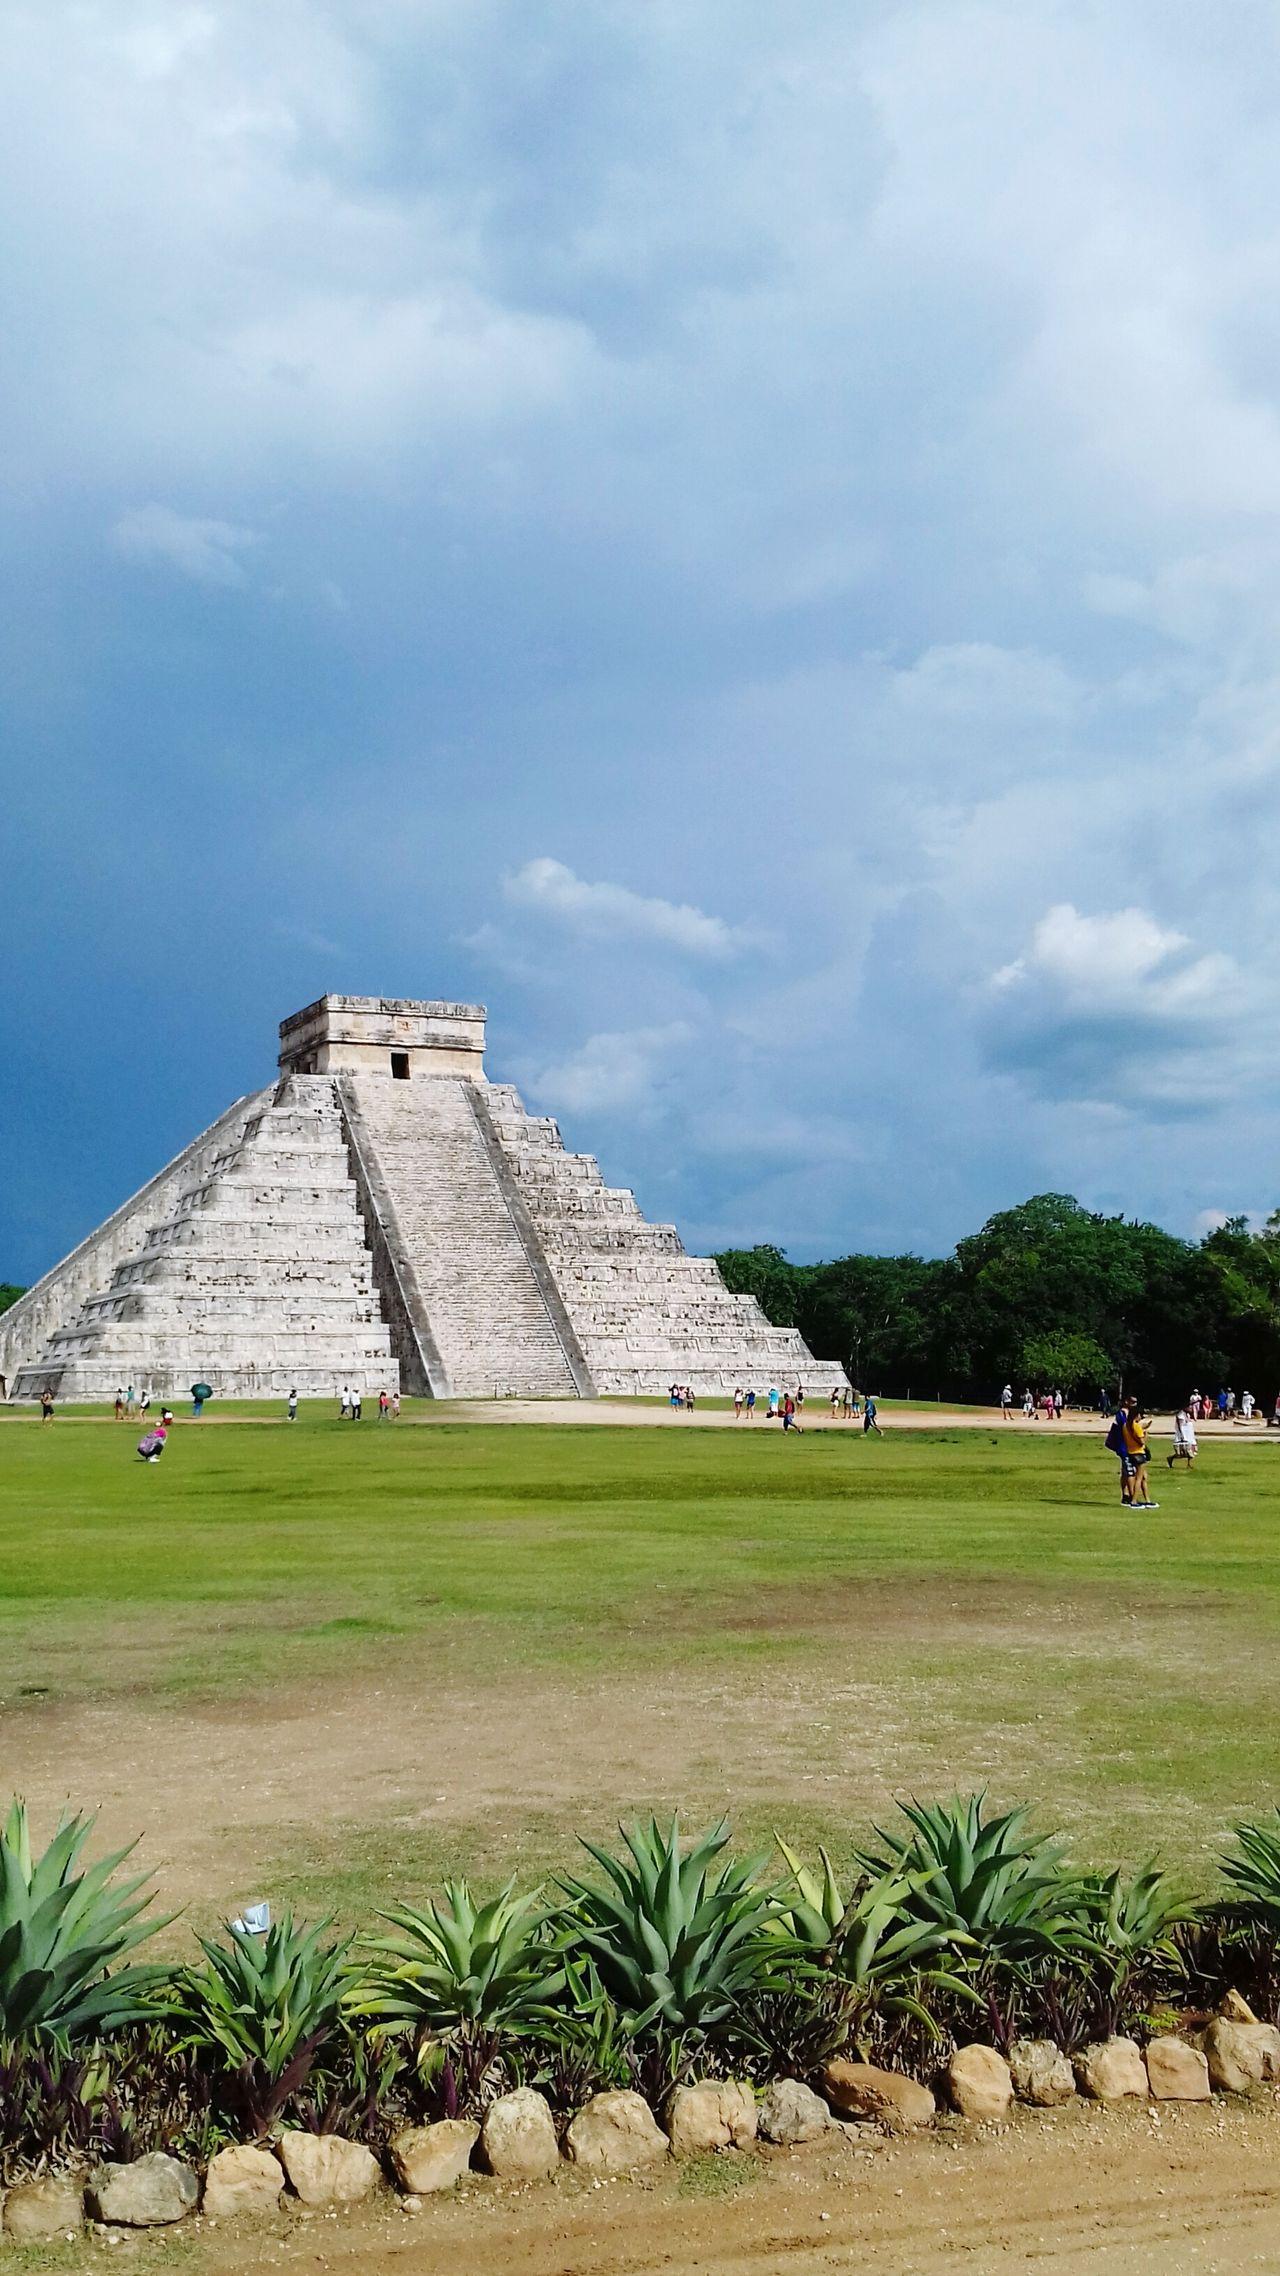 Kukulkan Kukulcan Castle Chichen-Itzá Chichen Itza Mayan Ruins Mayan Culture History Pyramid Travel Destinations Architecture Outdoors Ancient Civilization Old Ruin Sky Ancient Spirituality Architecture Mexico Yucatan Mexico Yucatán, México